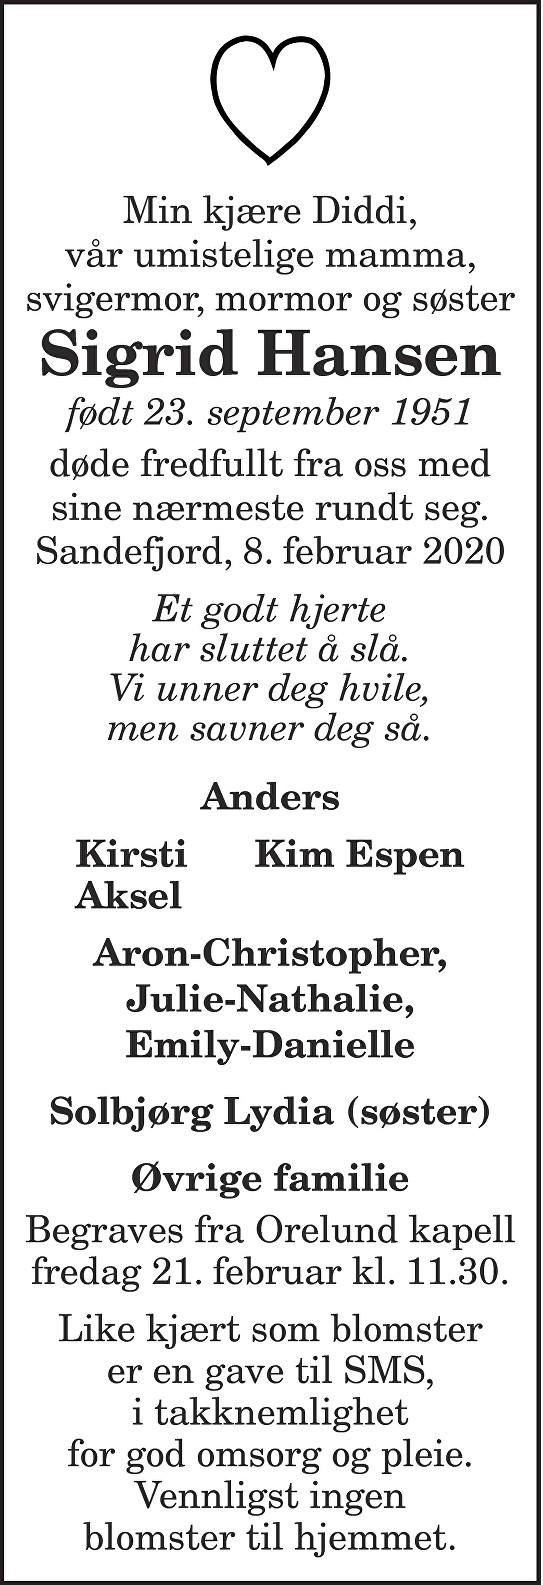 Sigrid Hansen Dødsannonse